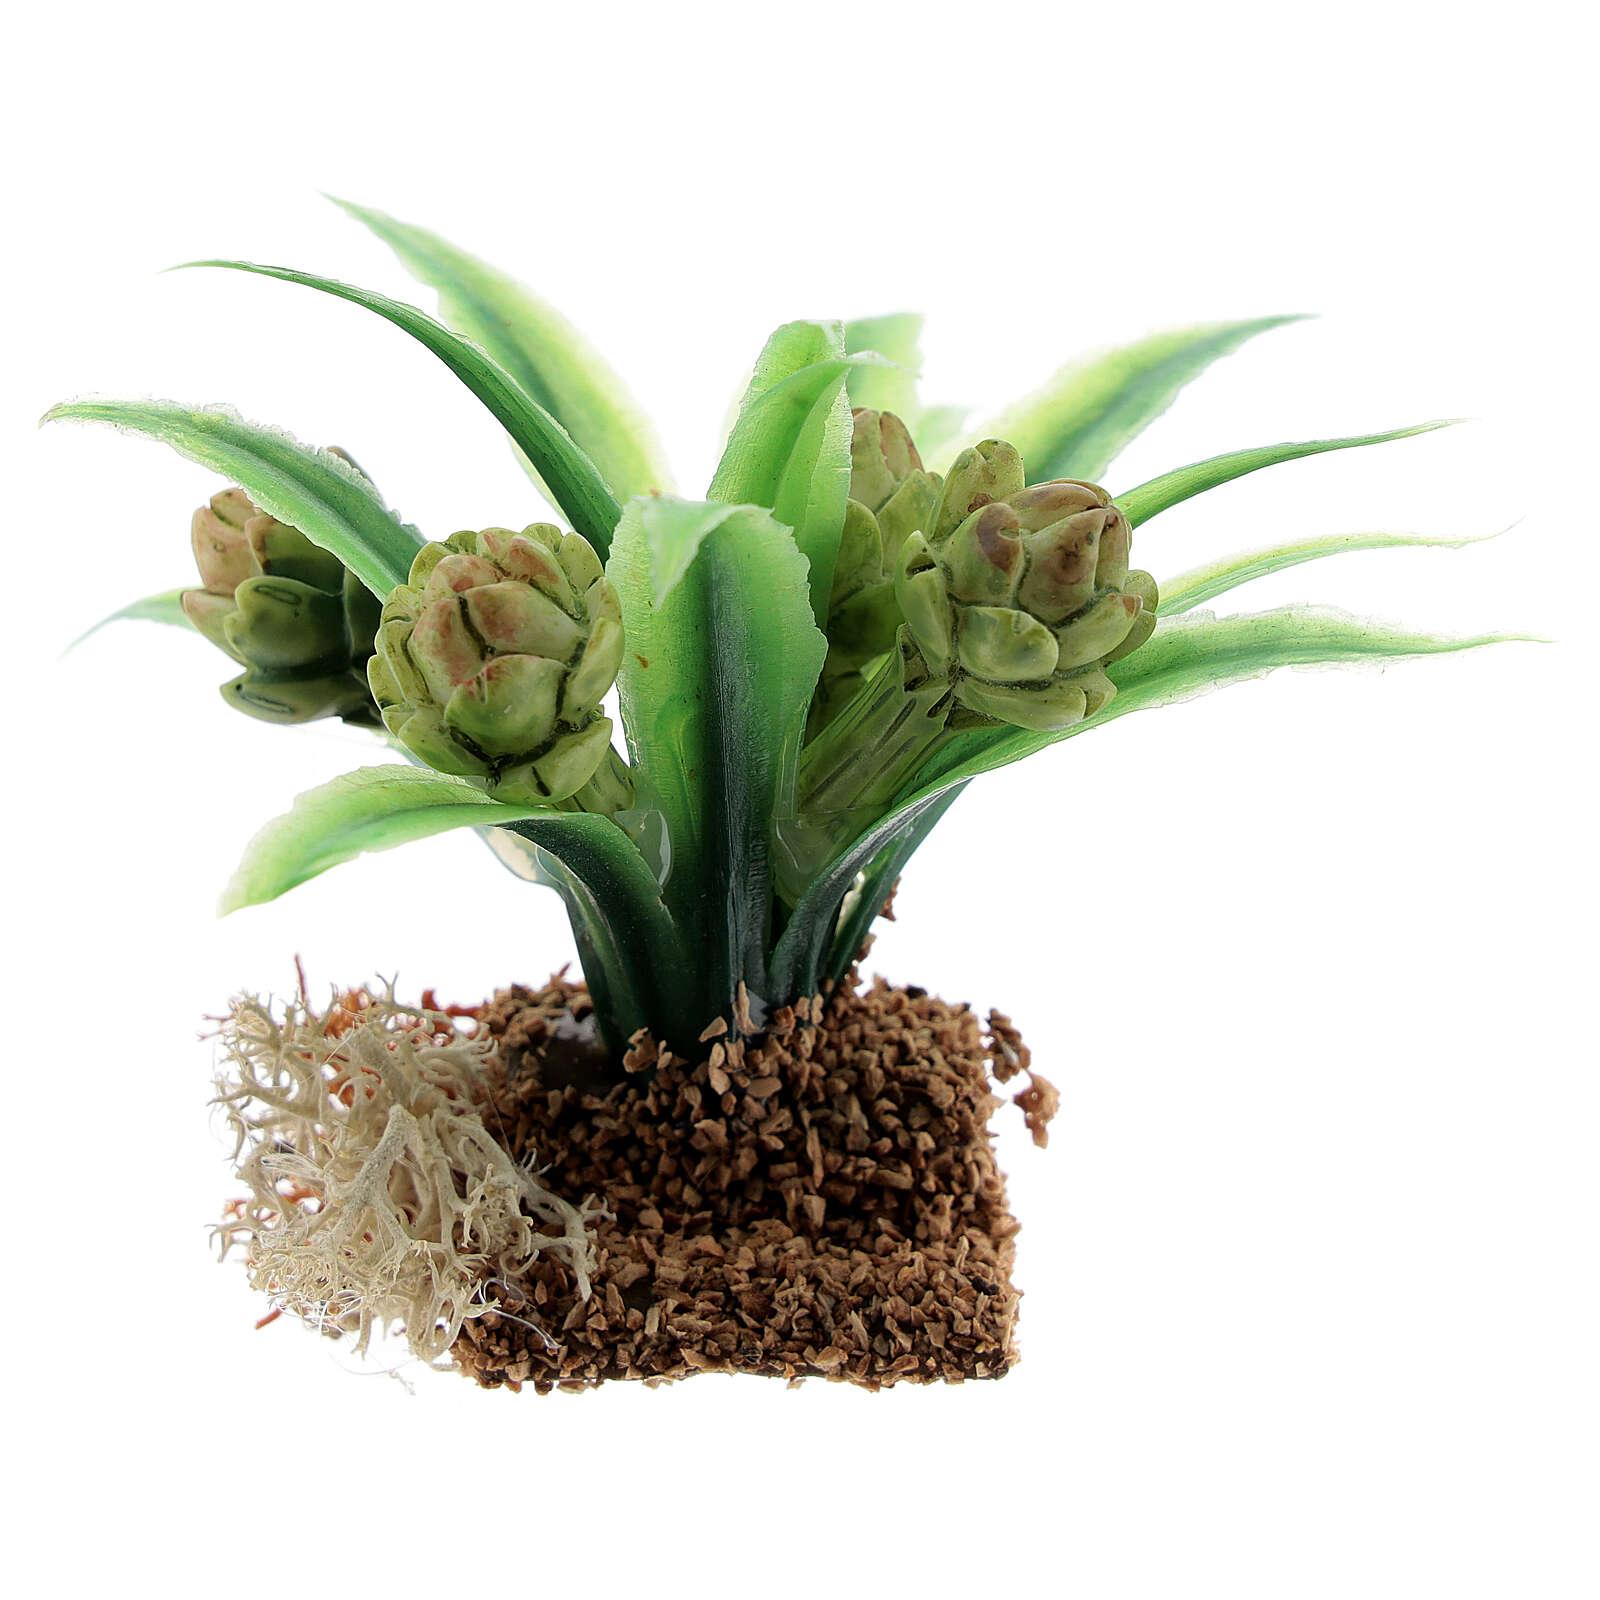 Pianta carciofo 6 cm presepe miniatura 12-14 cm 4